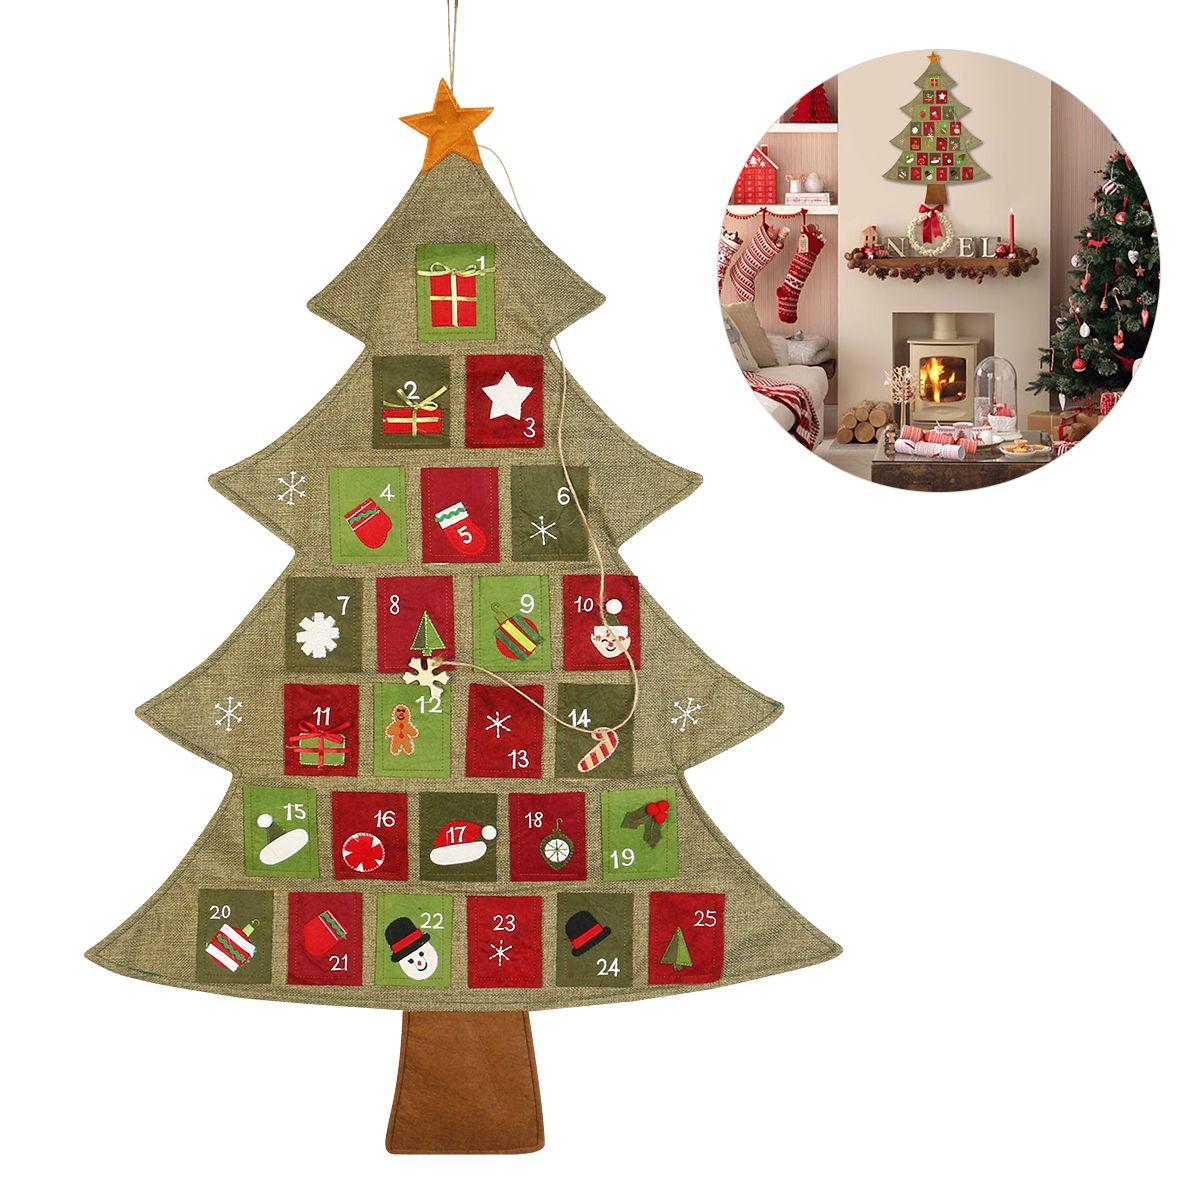 2019 Merry Christmas Advent Calendar Wall Hanging Noel Xmas ...